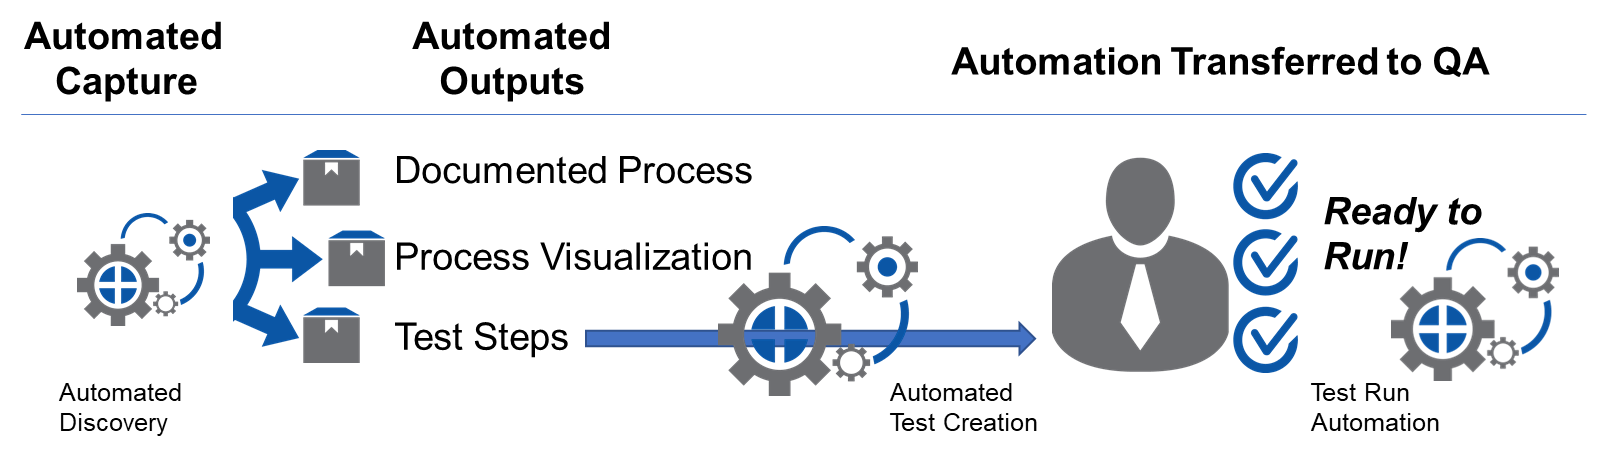 Rethink automation